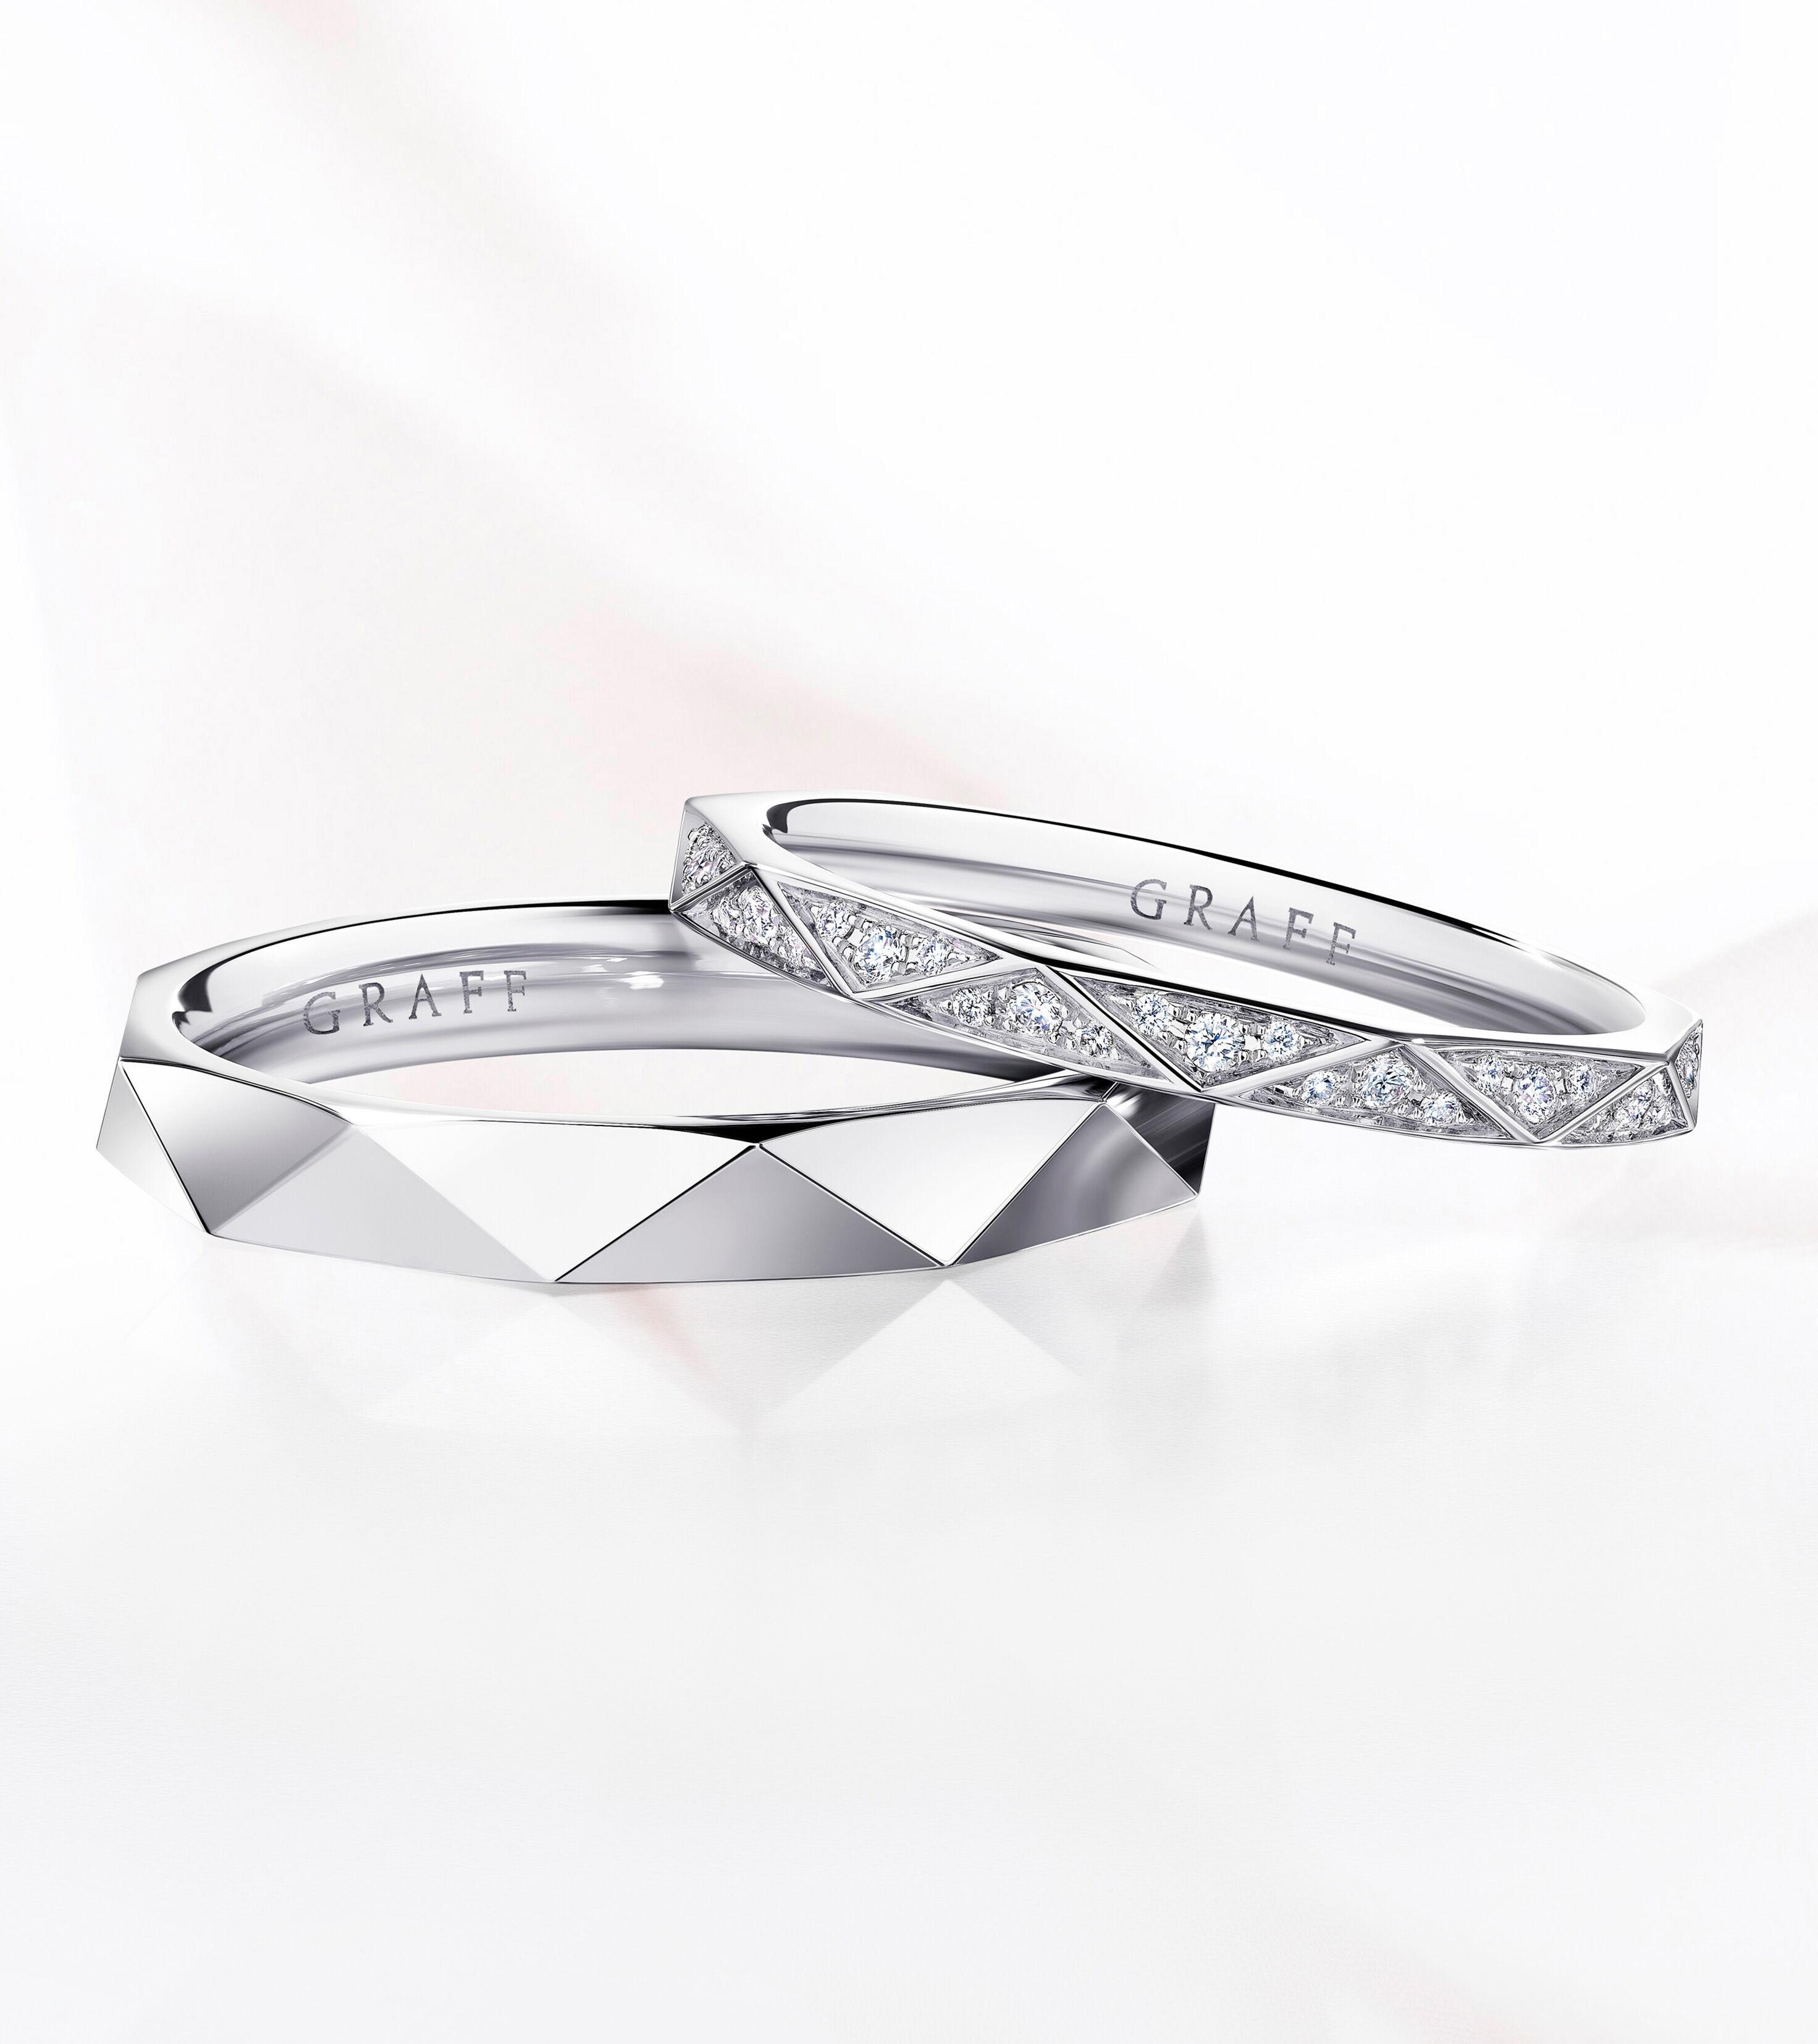 Graff Extraordinary Fine Diamond Jewellery And Swiss Watches